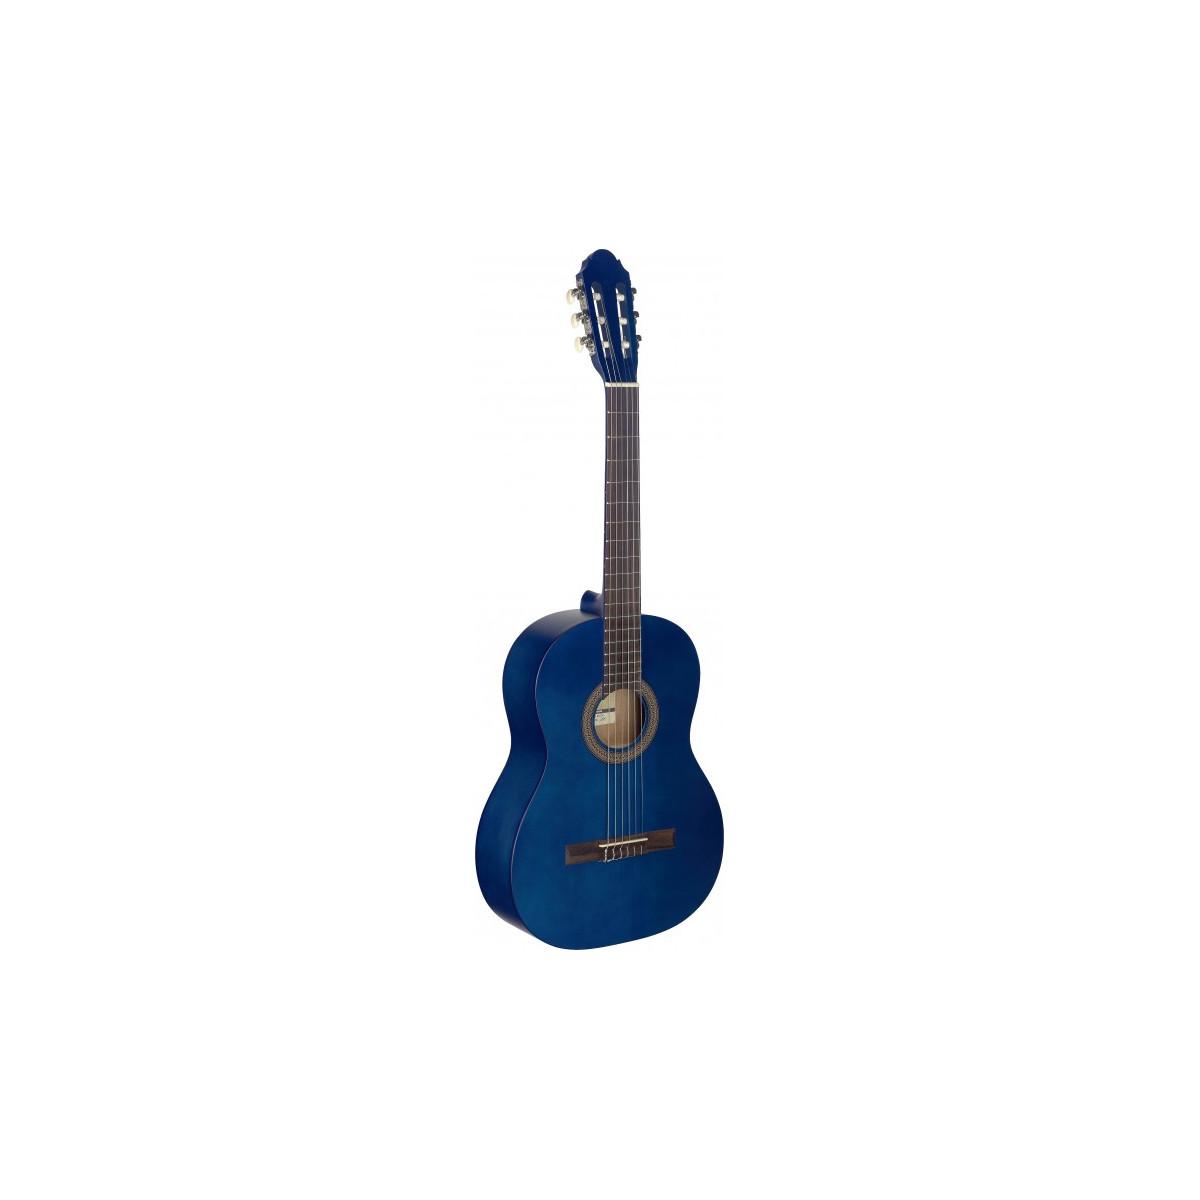 Guitare Classique 4/4 Tilleul Bleu